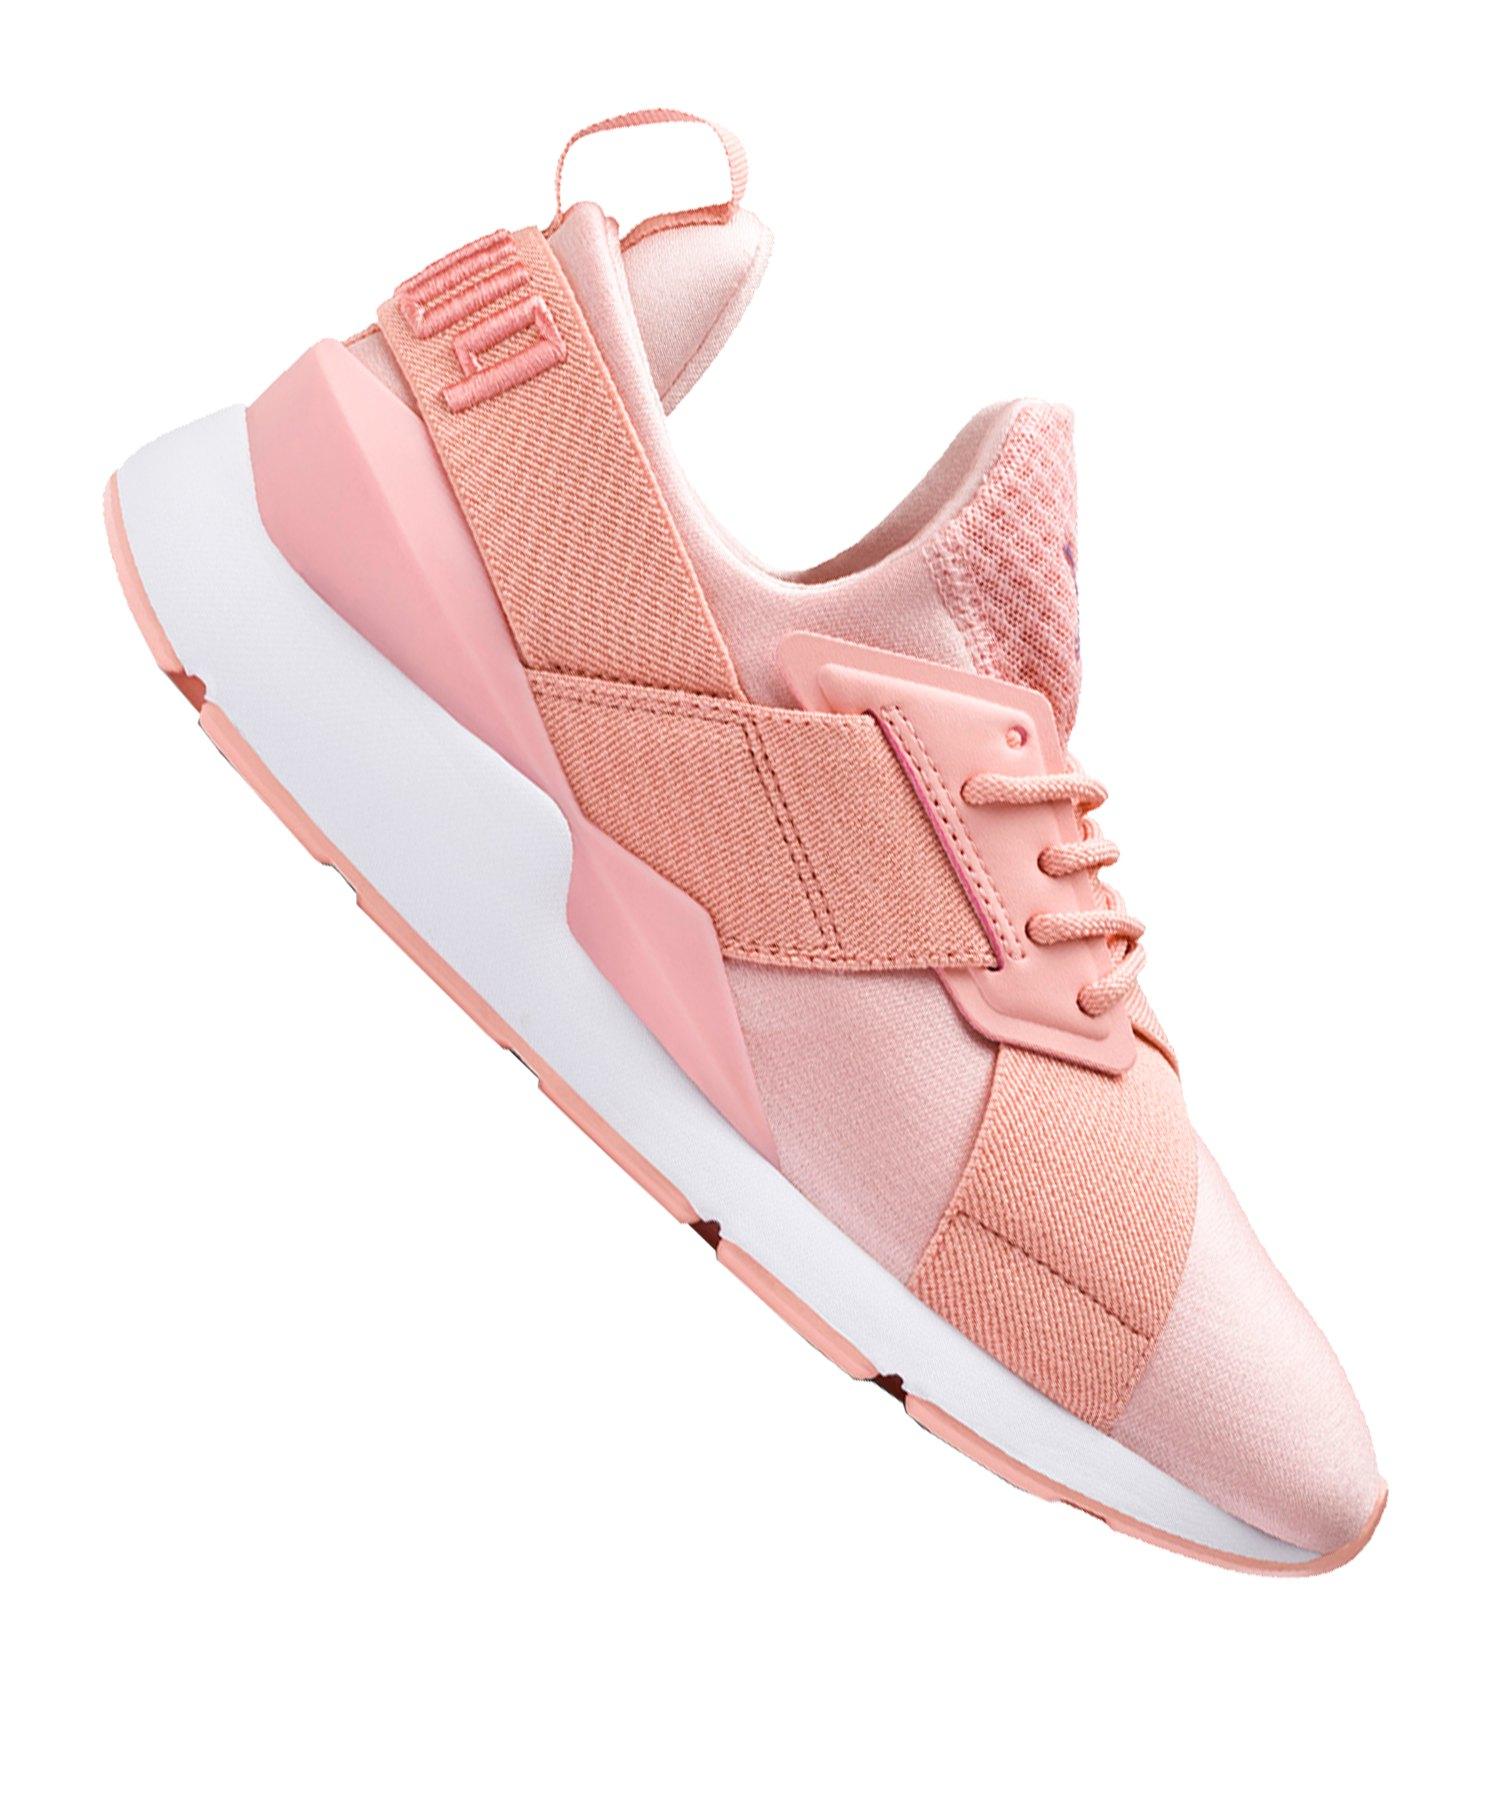 PUMA Muse Satin EP Sneaker Damen Rosa F12